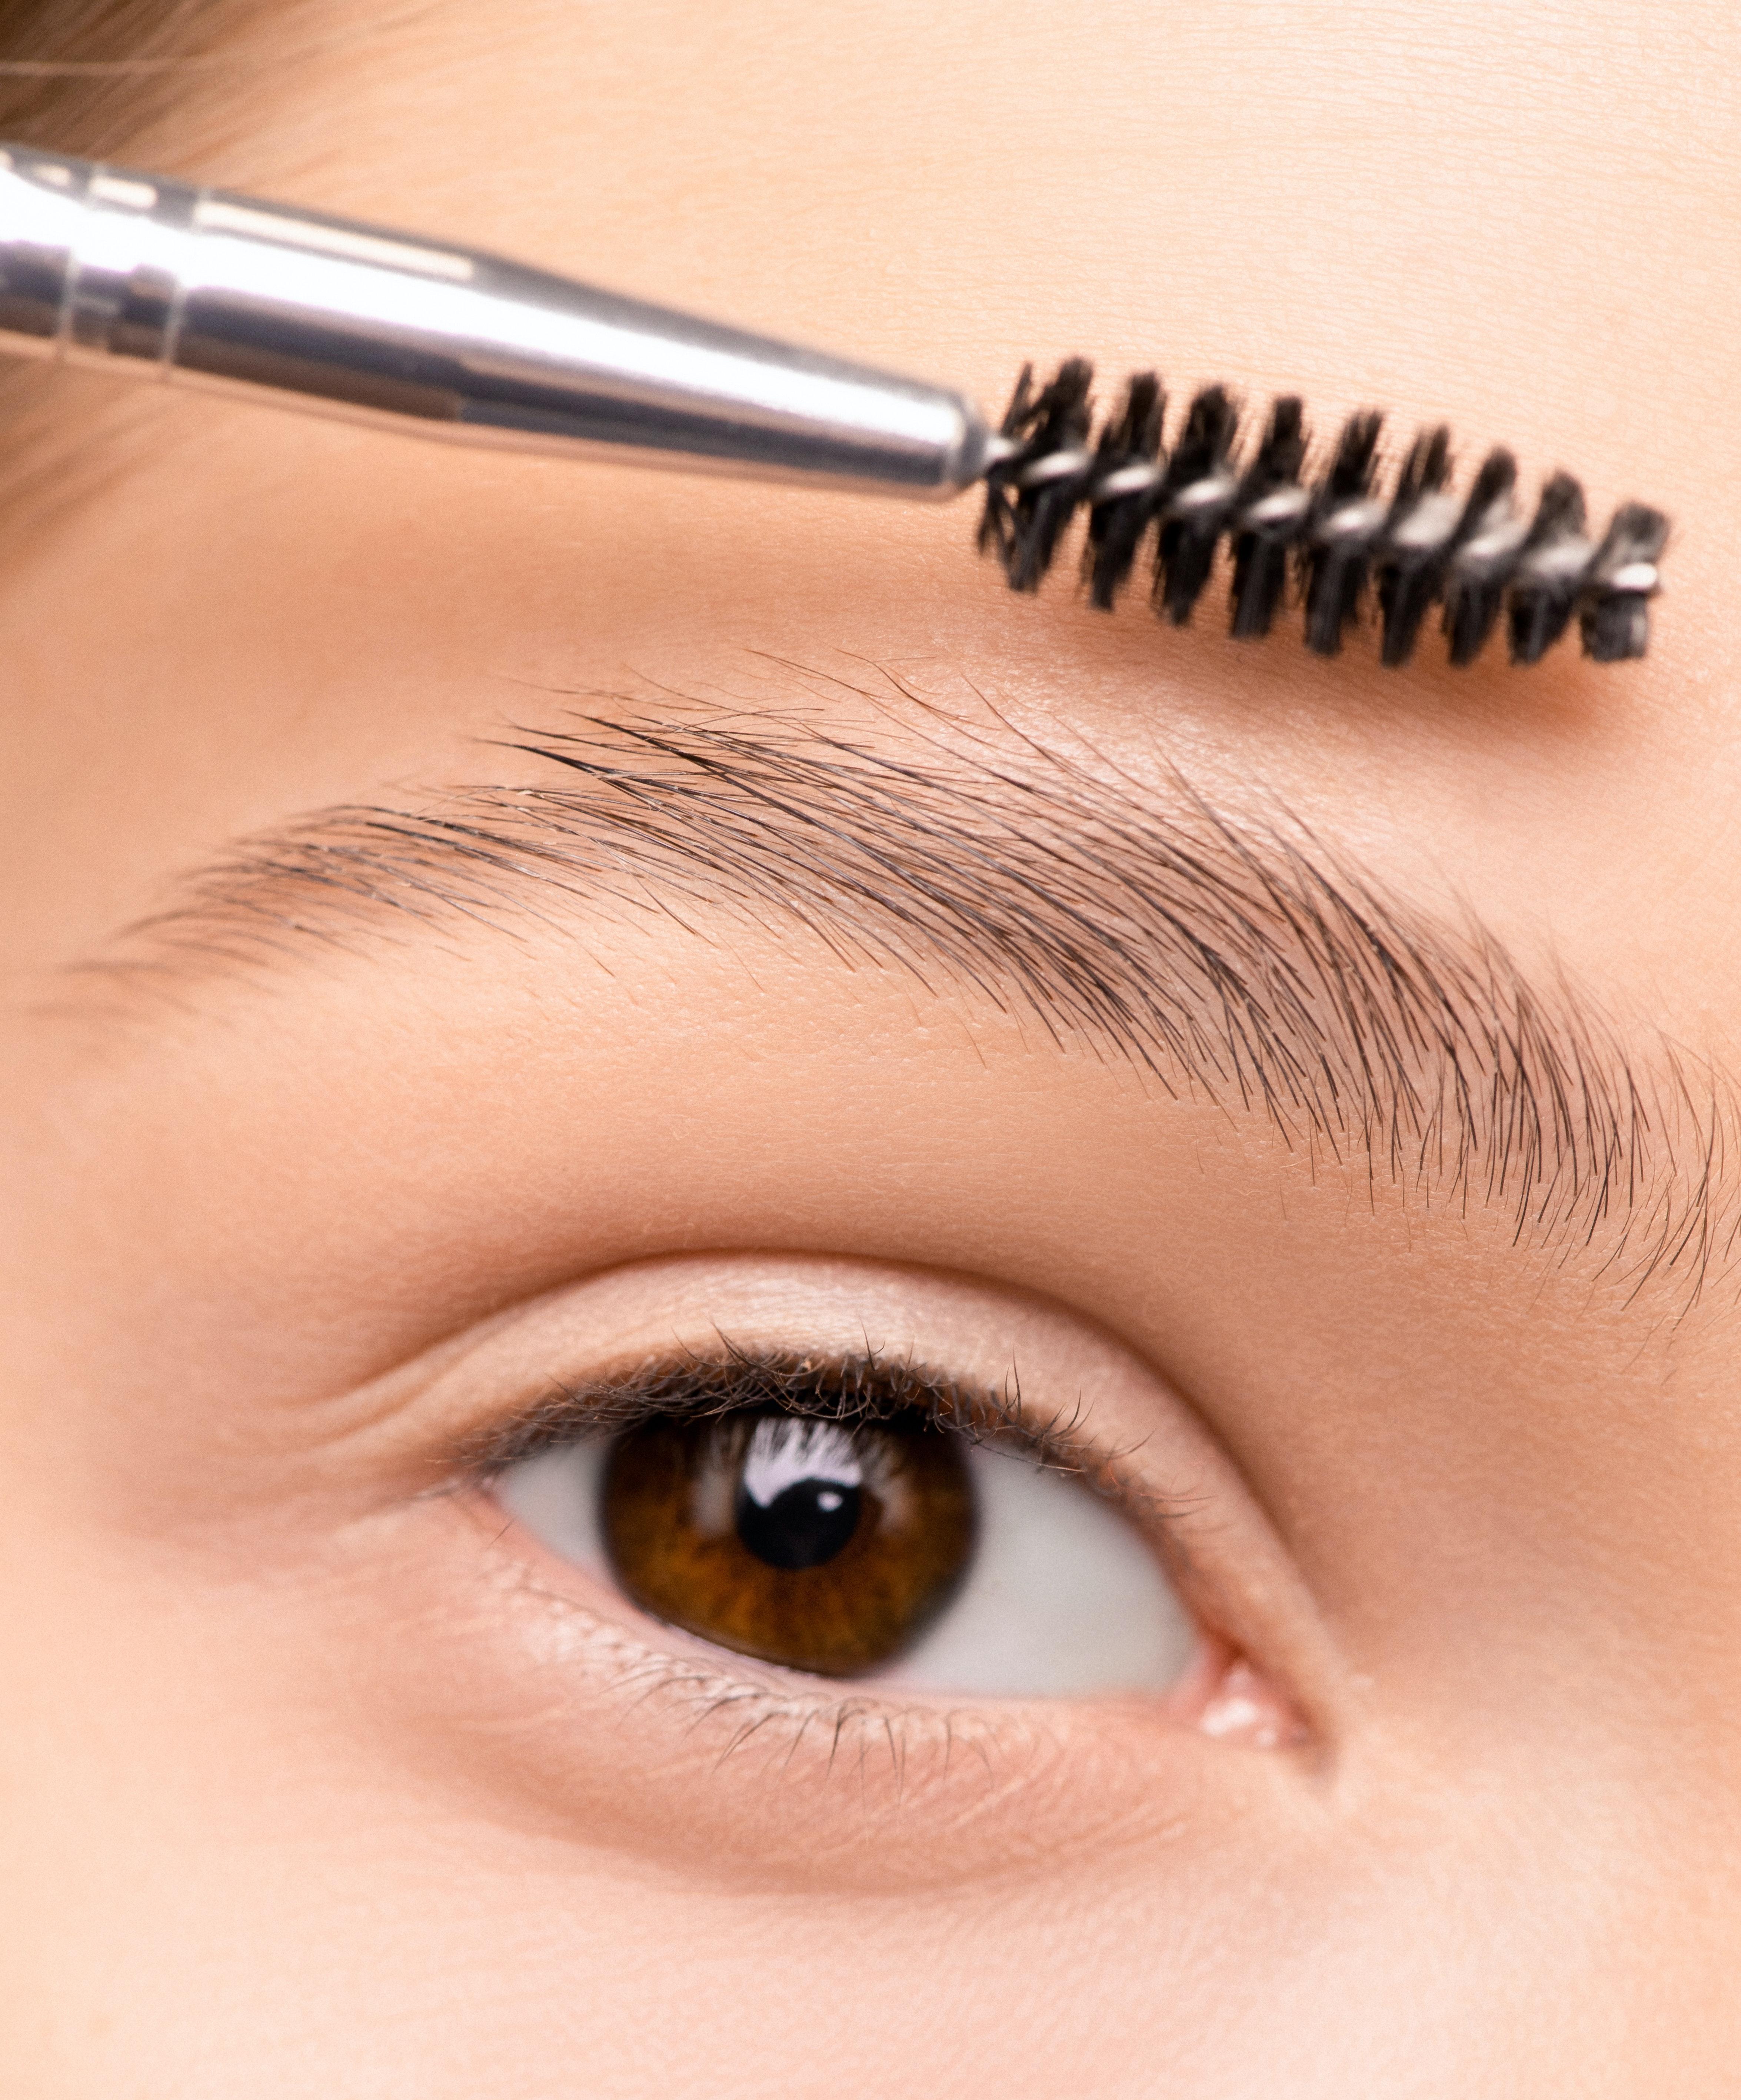 mascara applicator 3762664